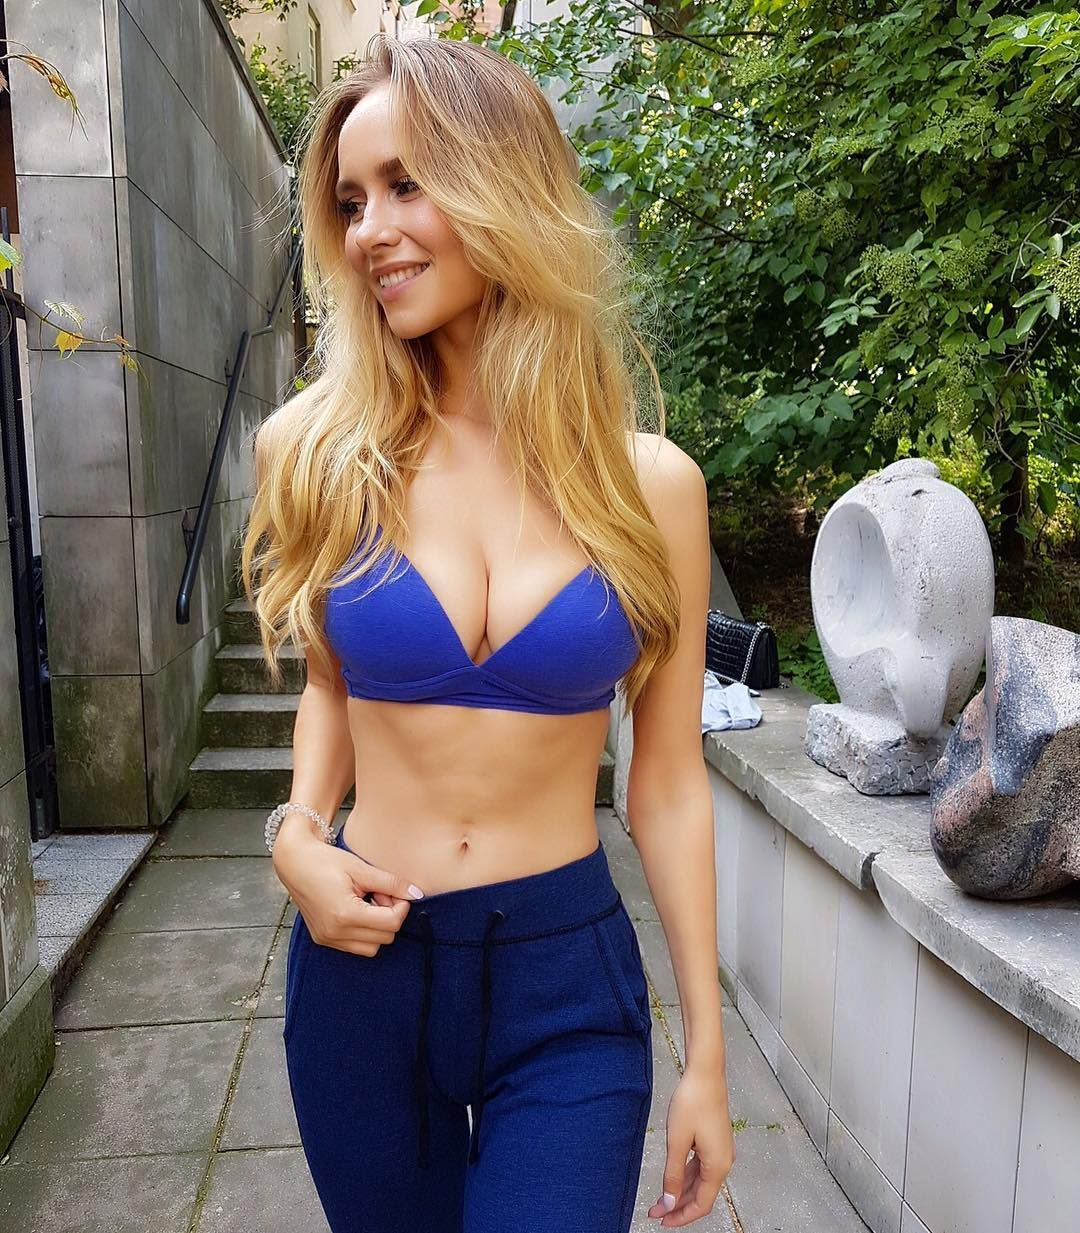 Quattro bikini razor reviews